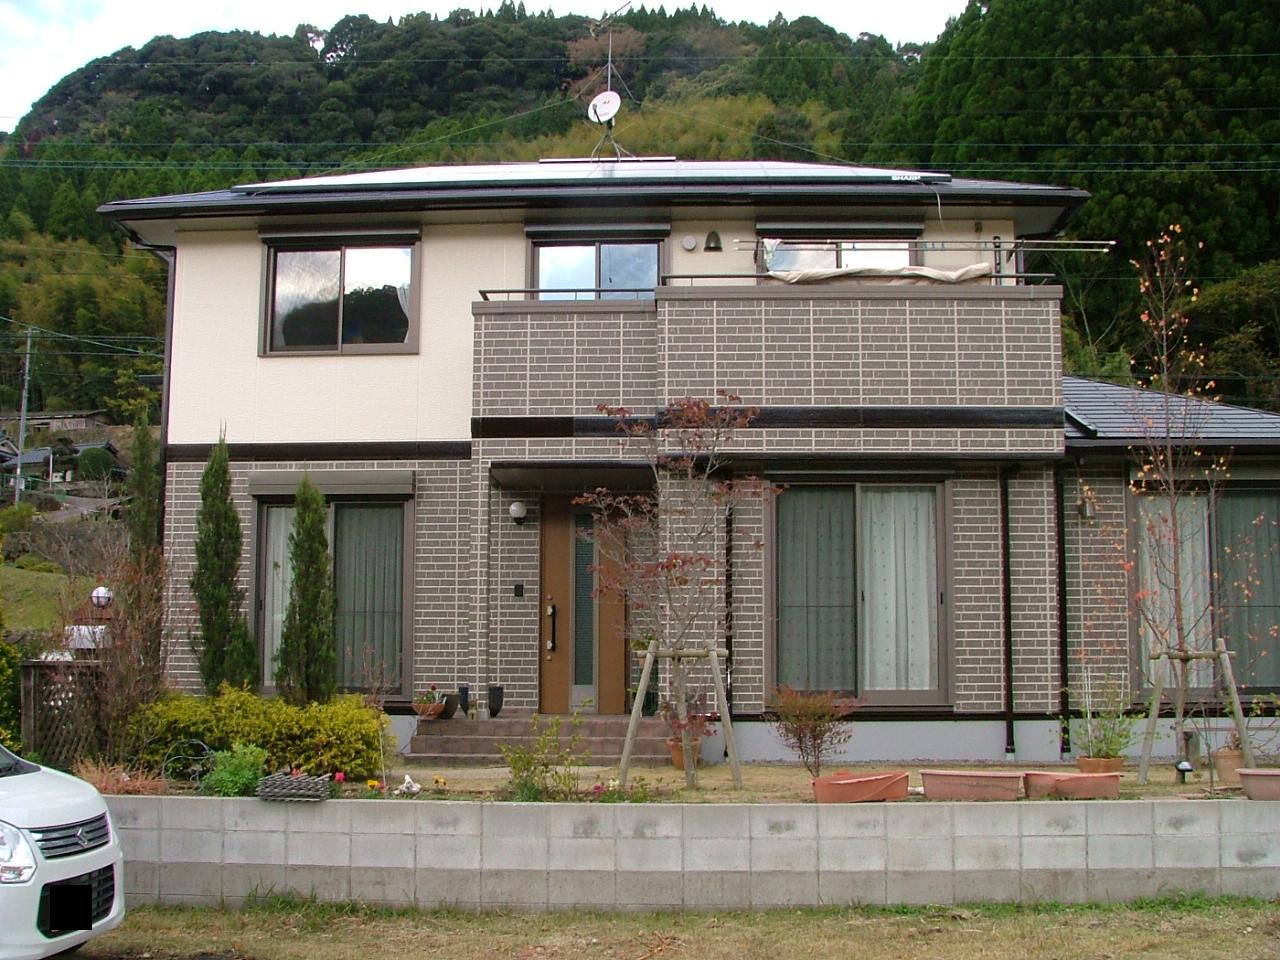 S様邸外壁屋根塗装工事施工後写真。タイル模様になっていた1階壁とベランダ壁は目地取り工法でタイルの質感そのままに施工しました。